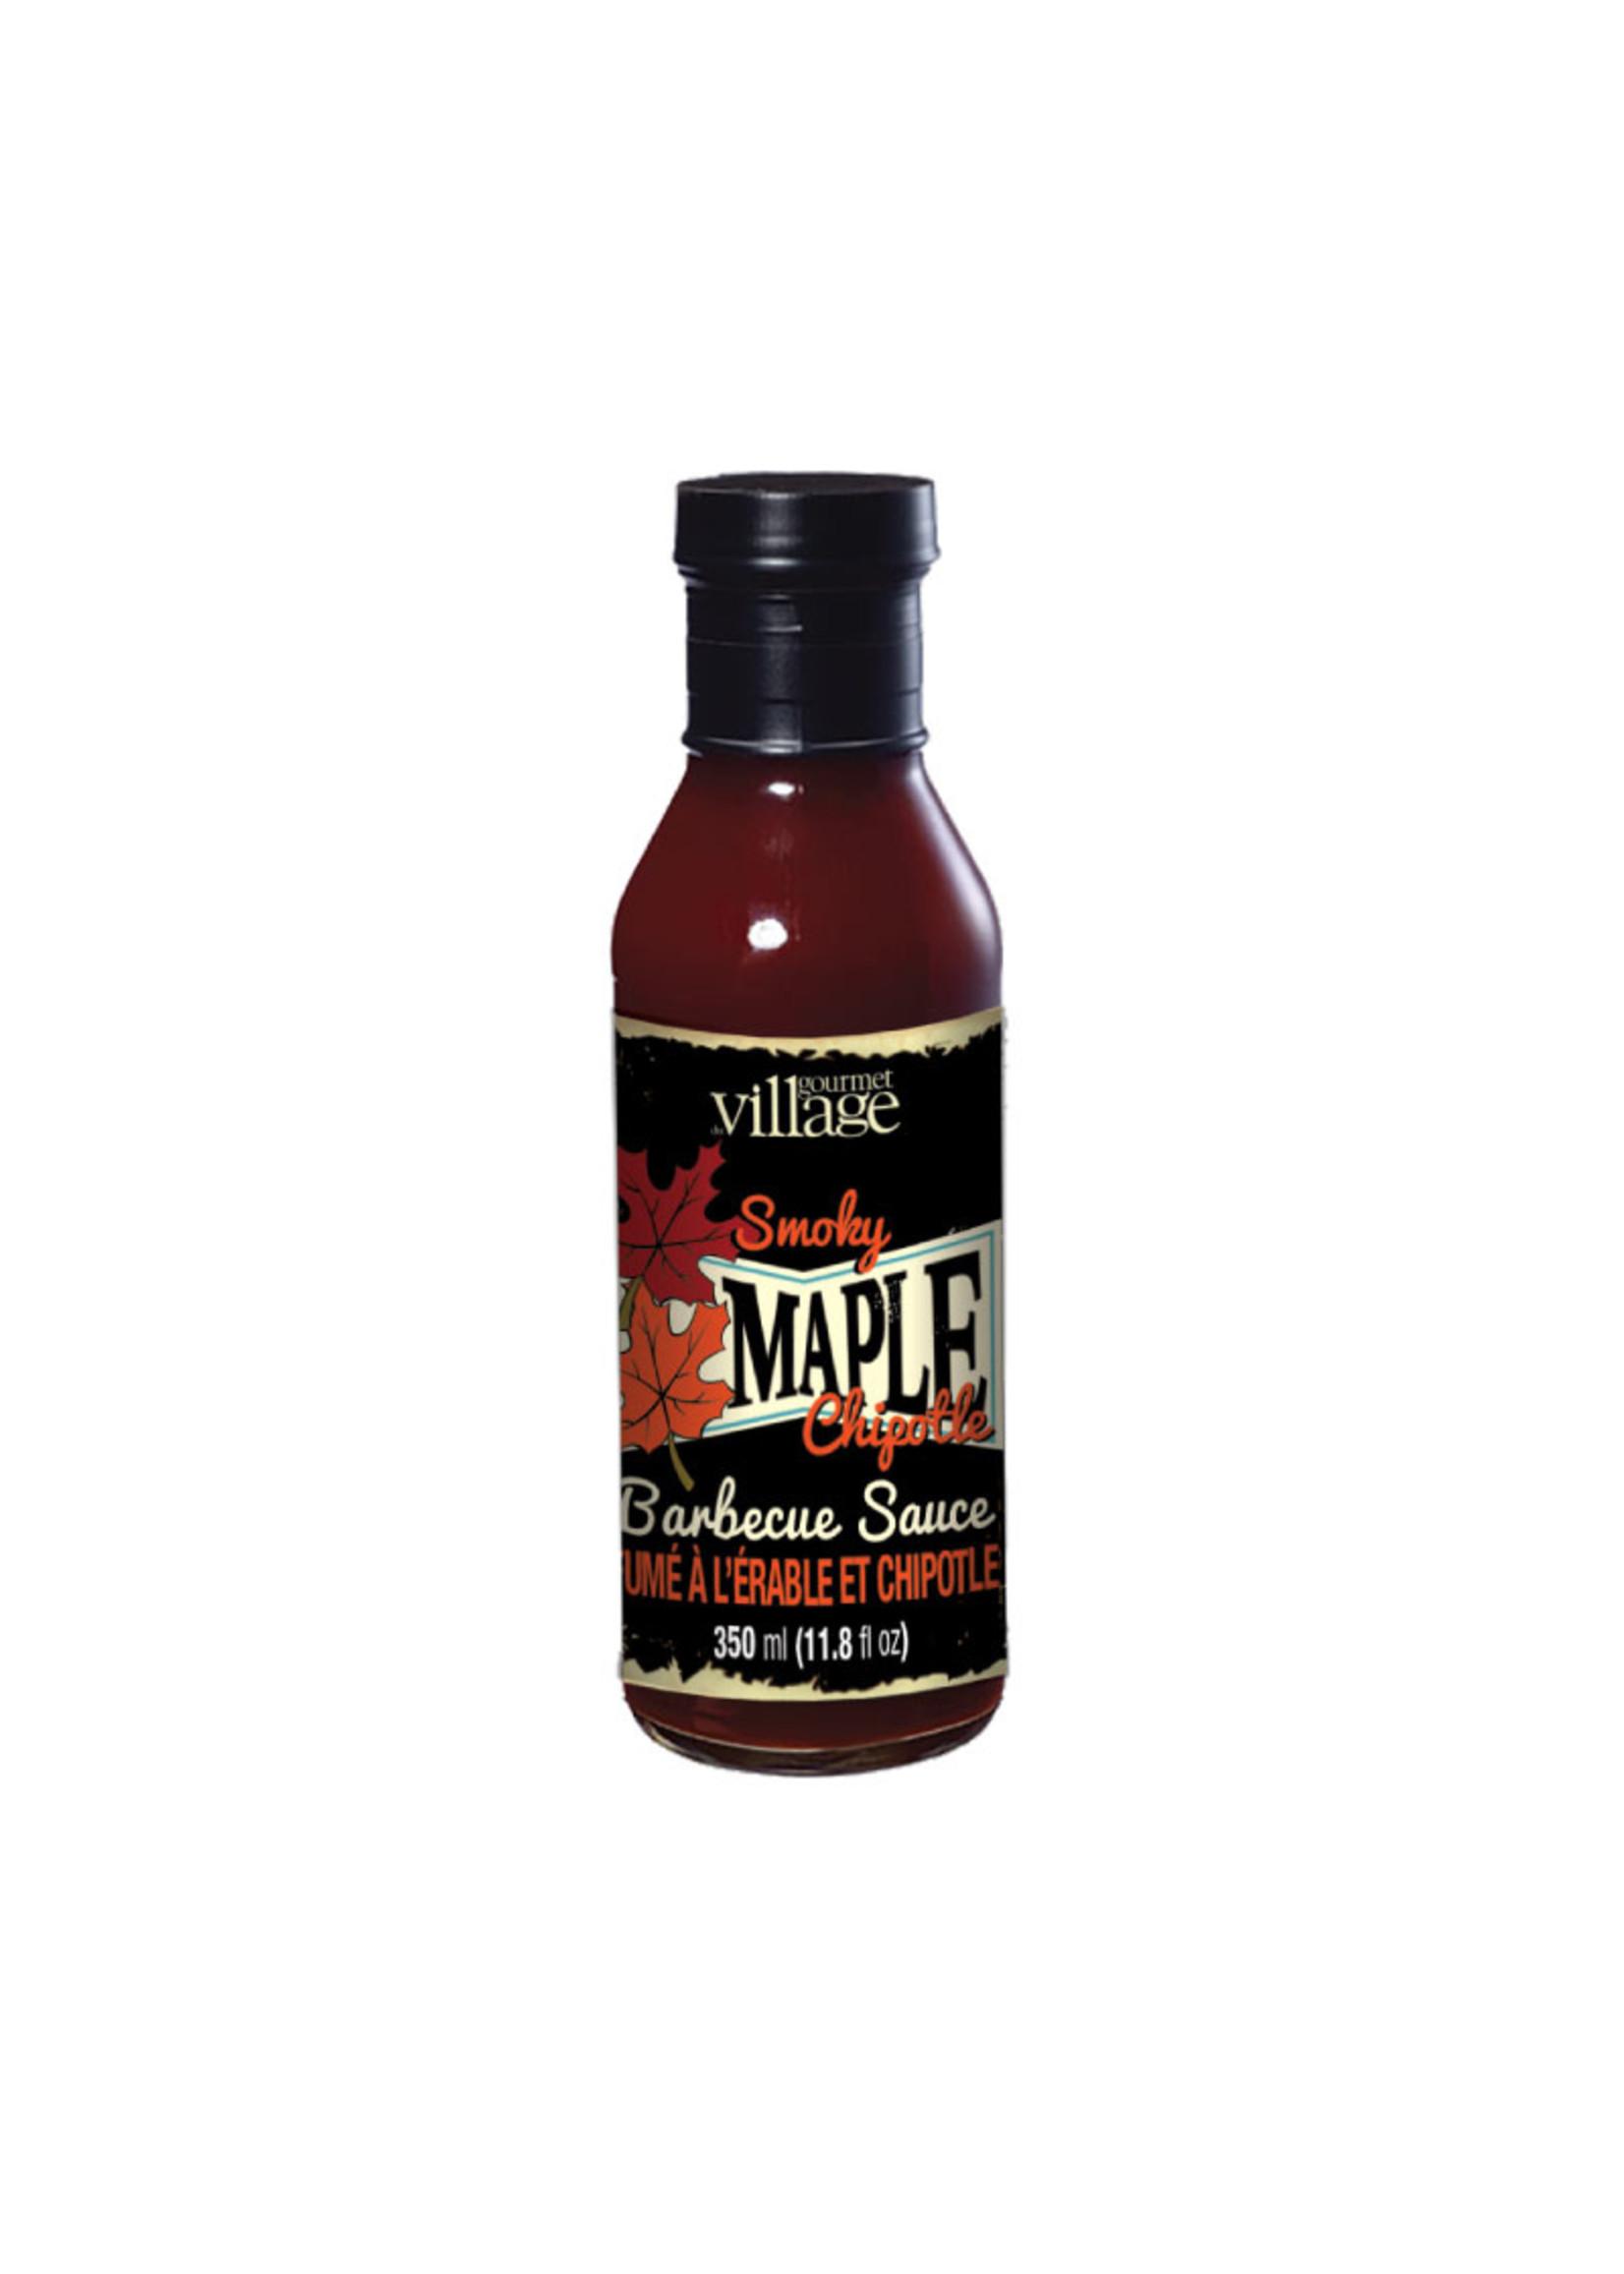 Gourmet Village Maple Chipotle BBQ Sauce